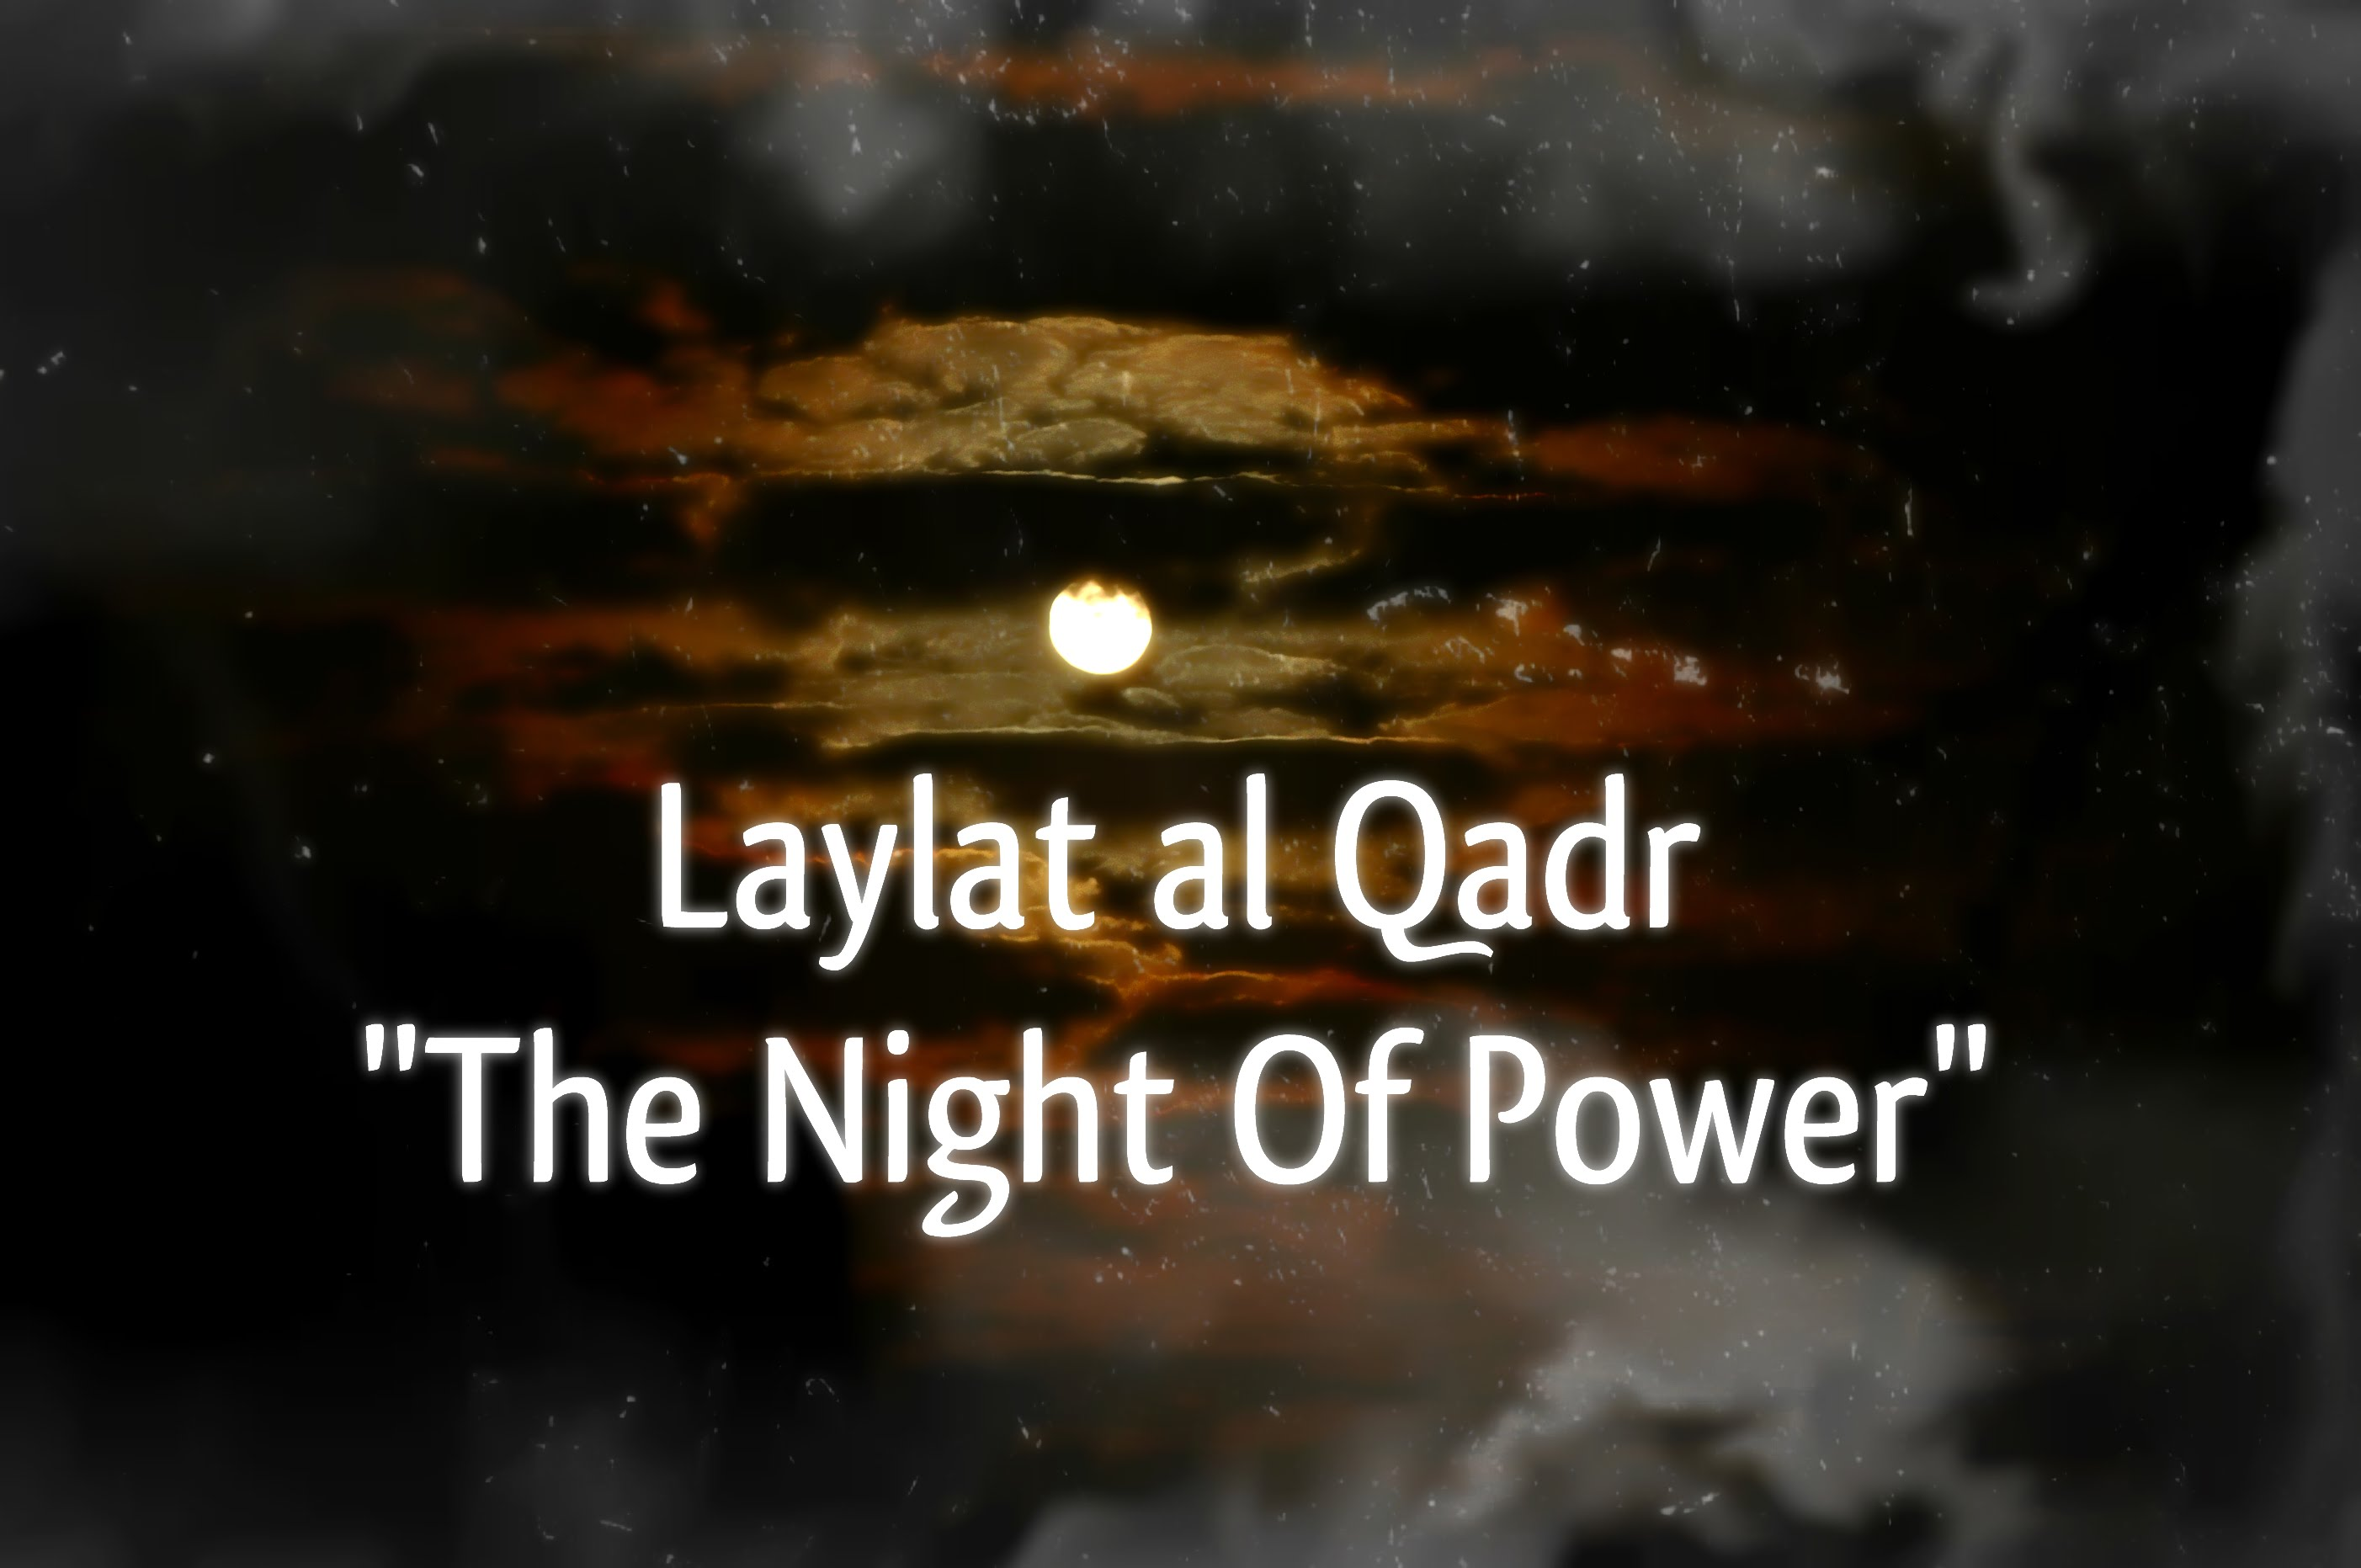 excellence-of-laylat-al-qadr